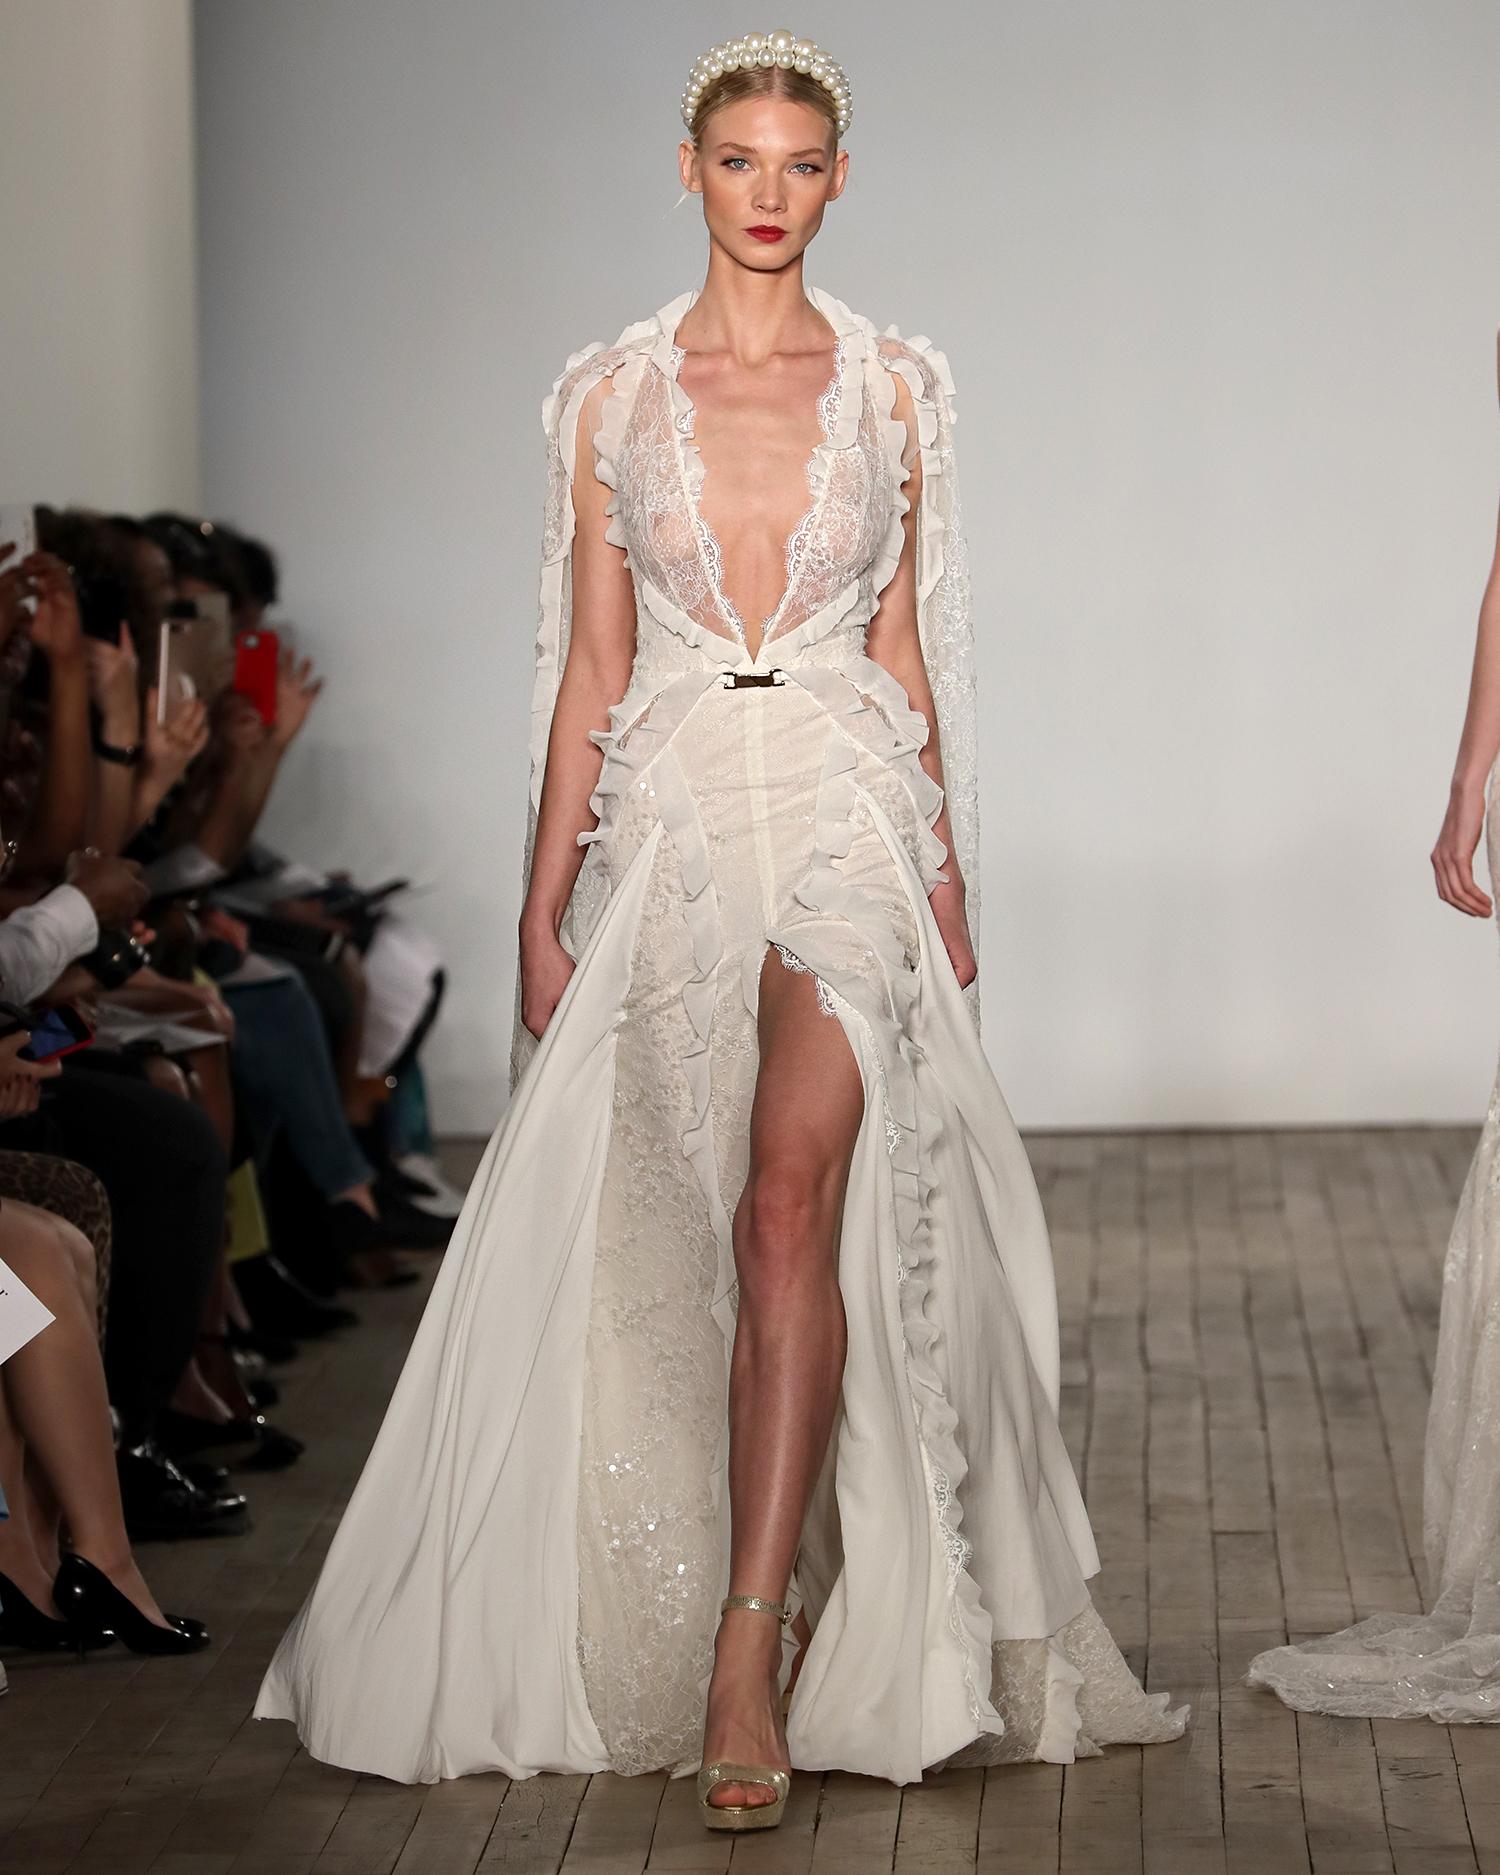 inbal dror wedding dress layered plunging v-neck with high slit